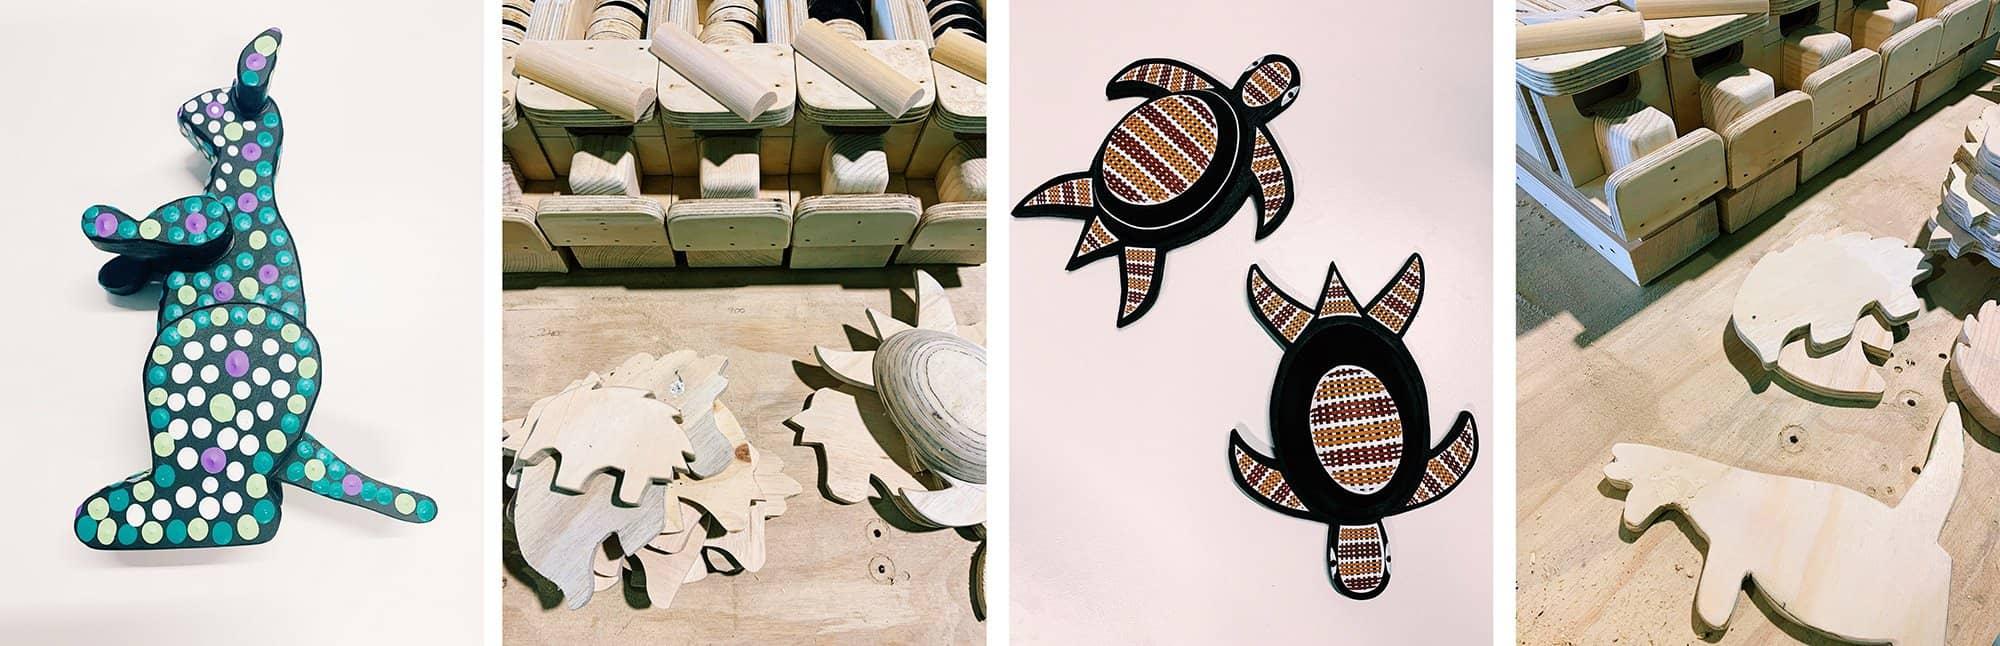 Painted turtle and kangaroo